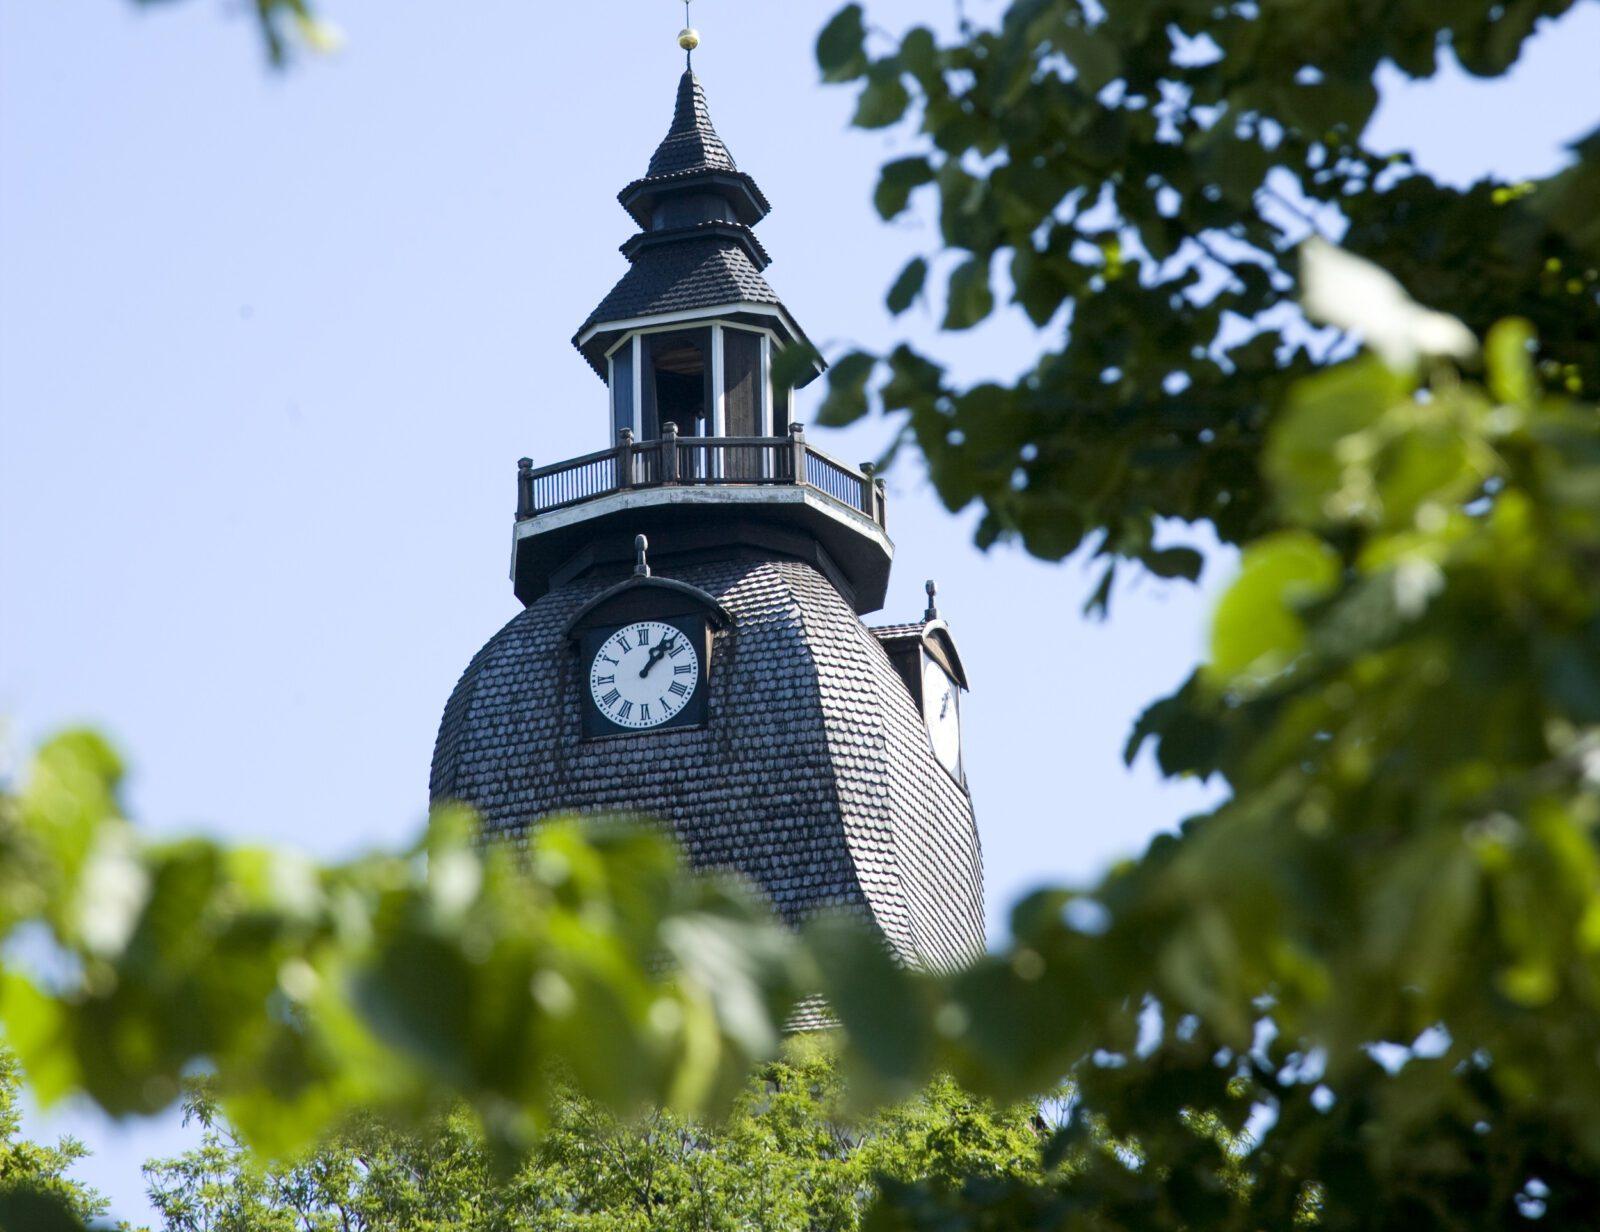 Naantalin kirkon torni puiden lehvien läpi.